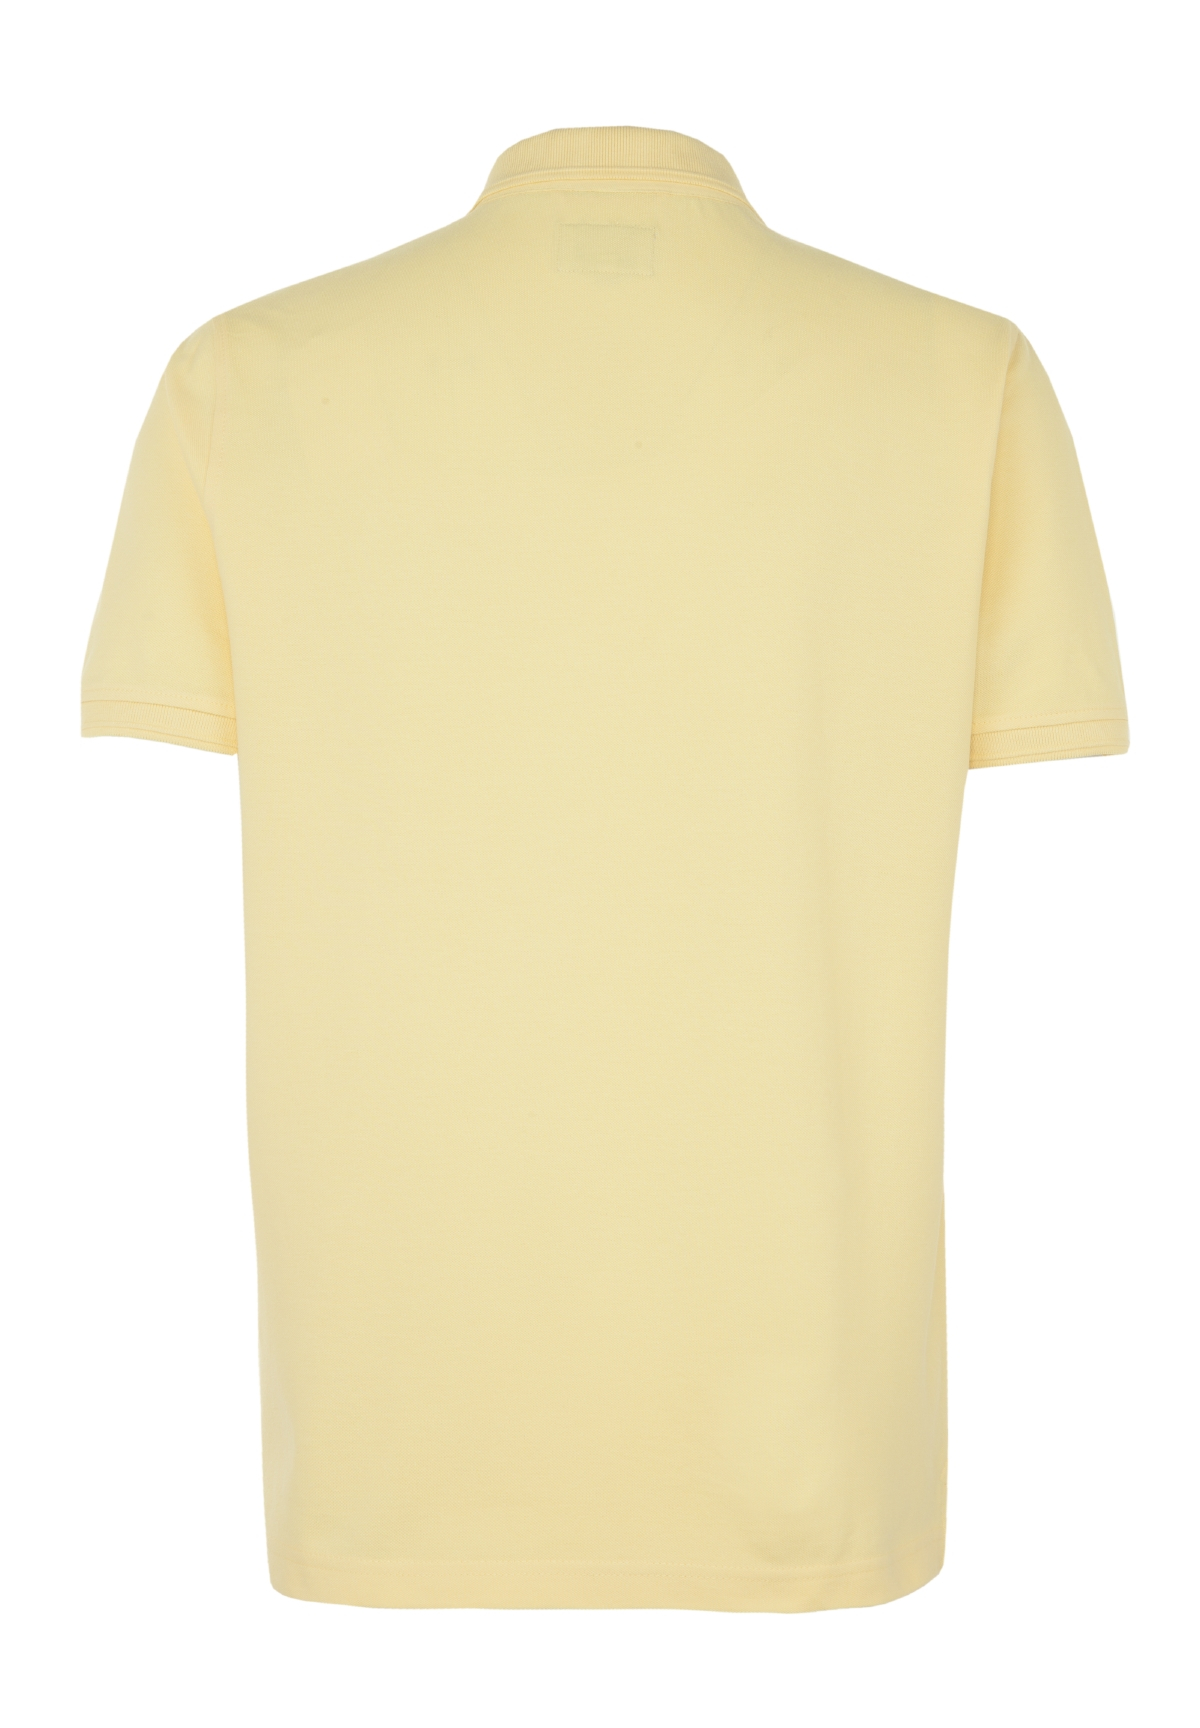 Camel-Active-Herren-Shirt-Poloshirt-Pique-Regular-Fit-NEU Indexbild 68